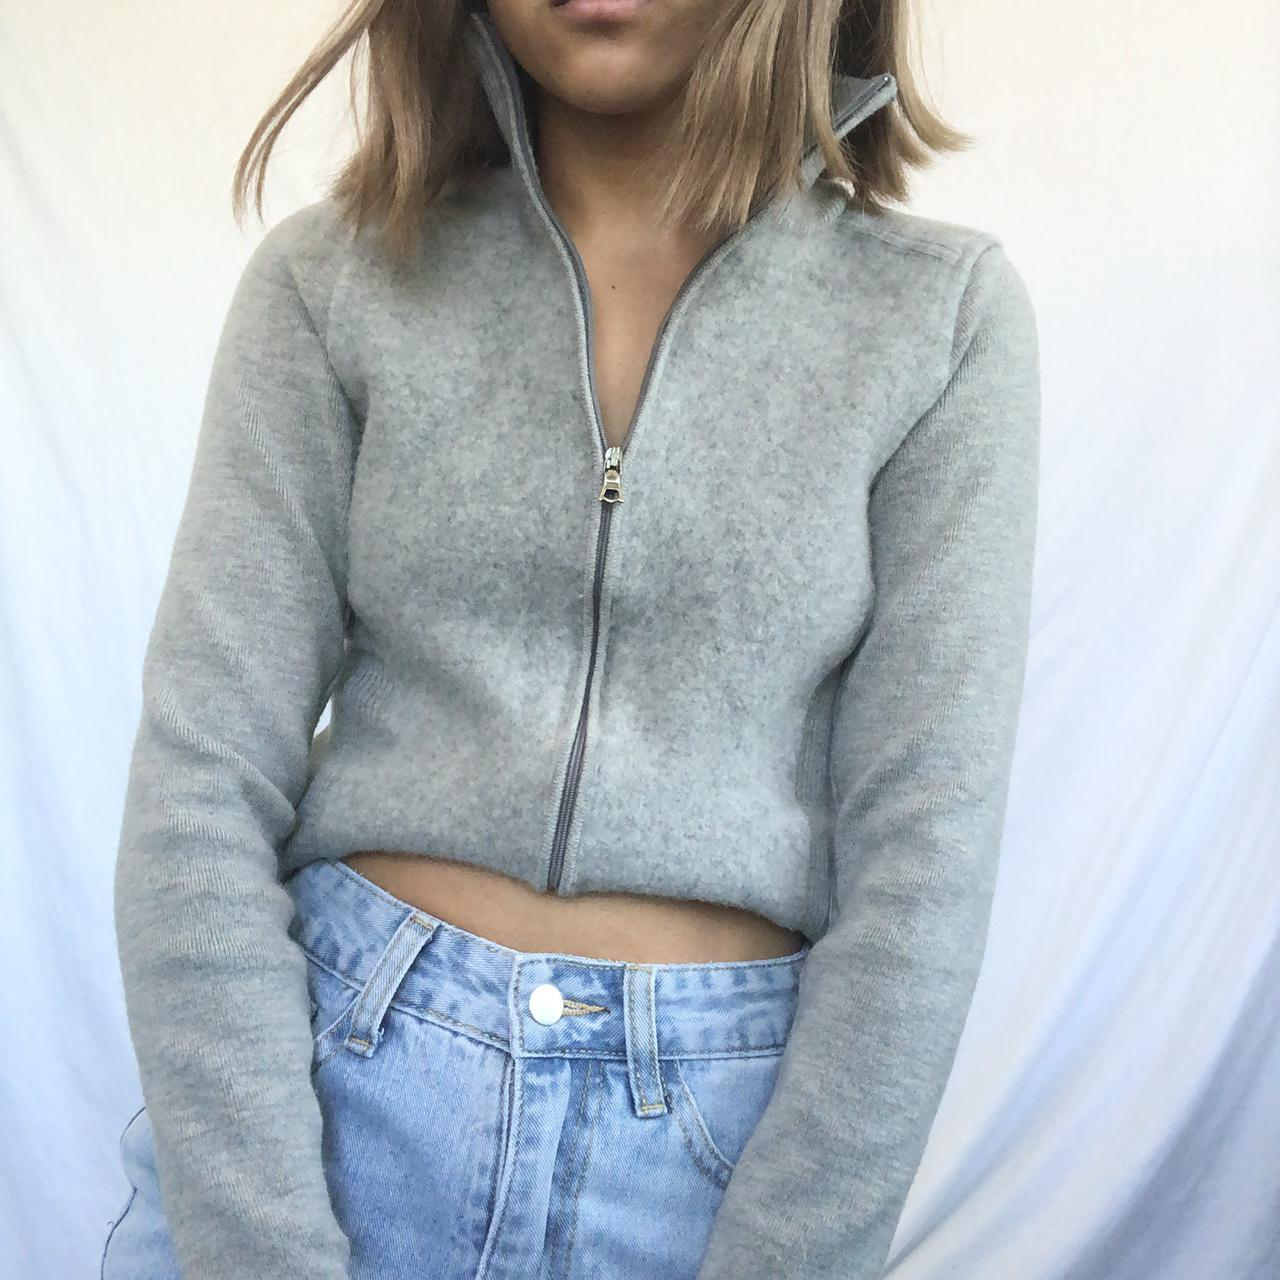 Product Image 1 - Grey knitted long sleeve sweatshirt